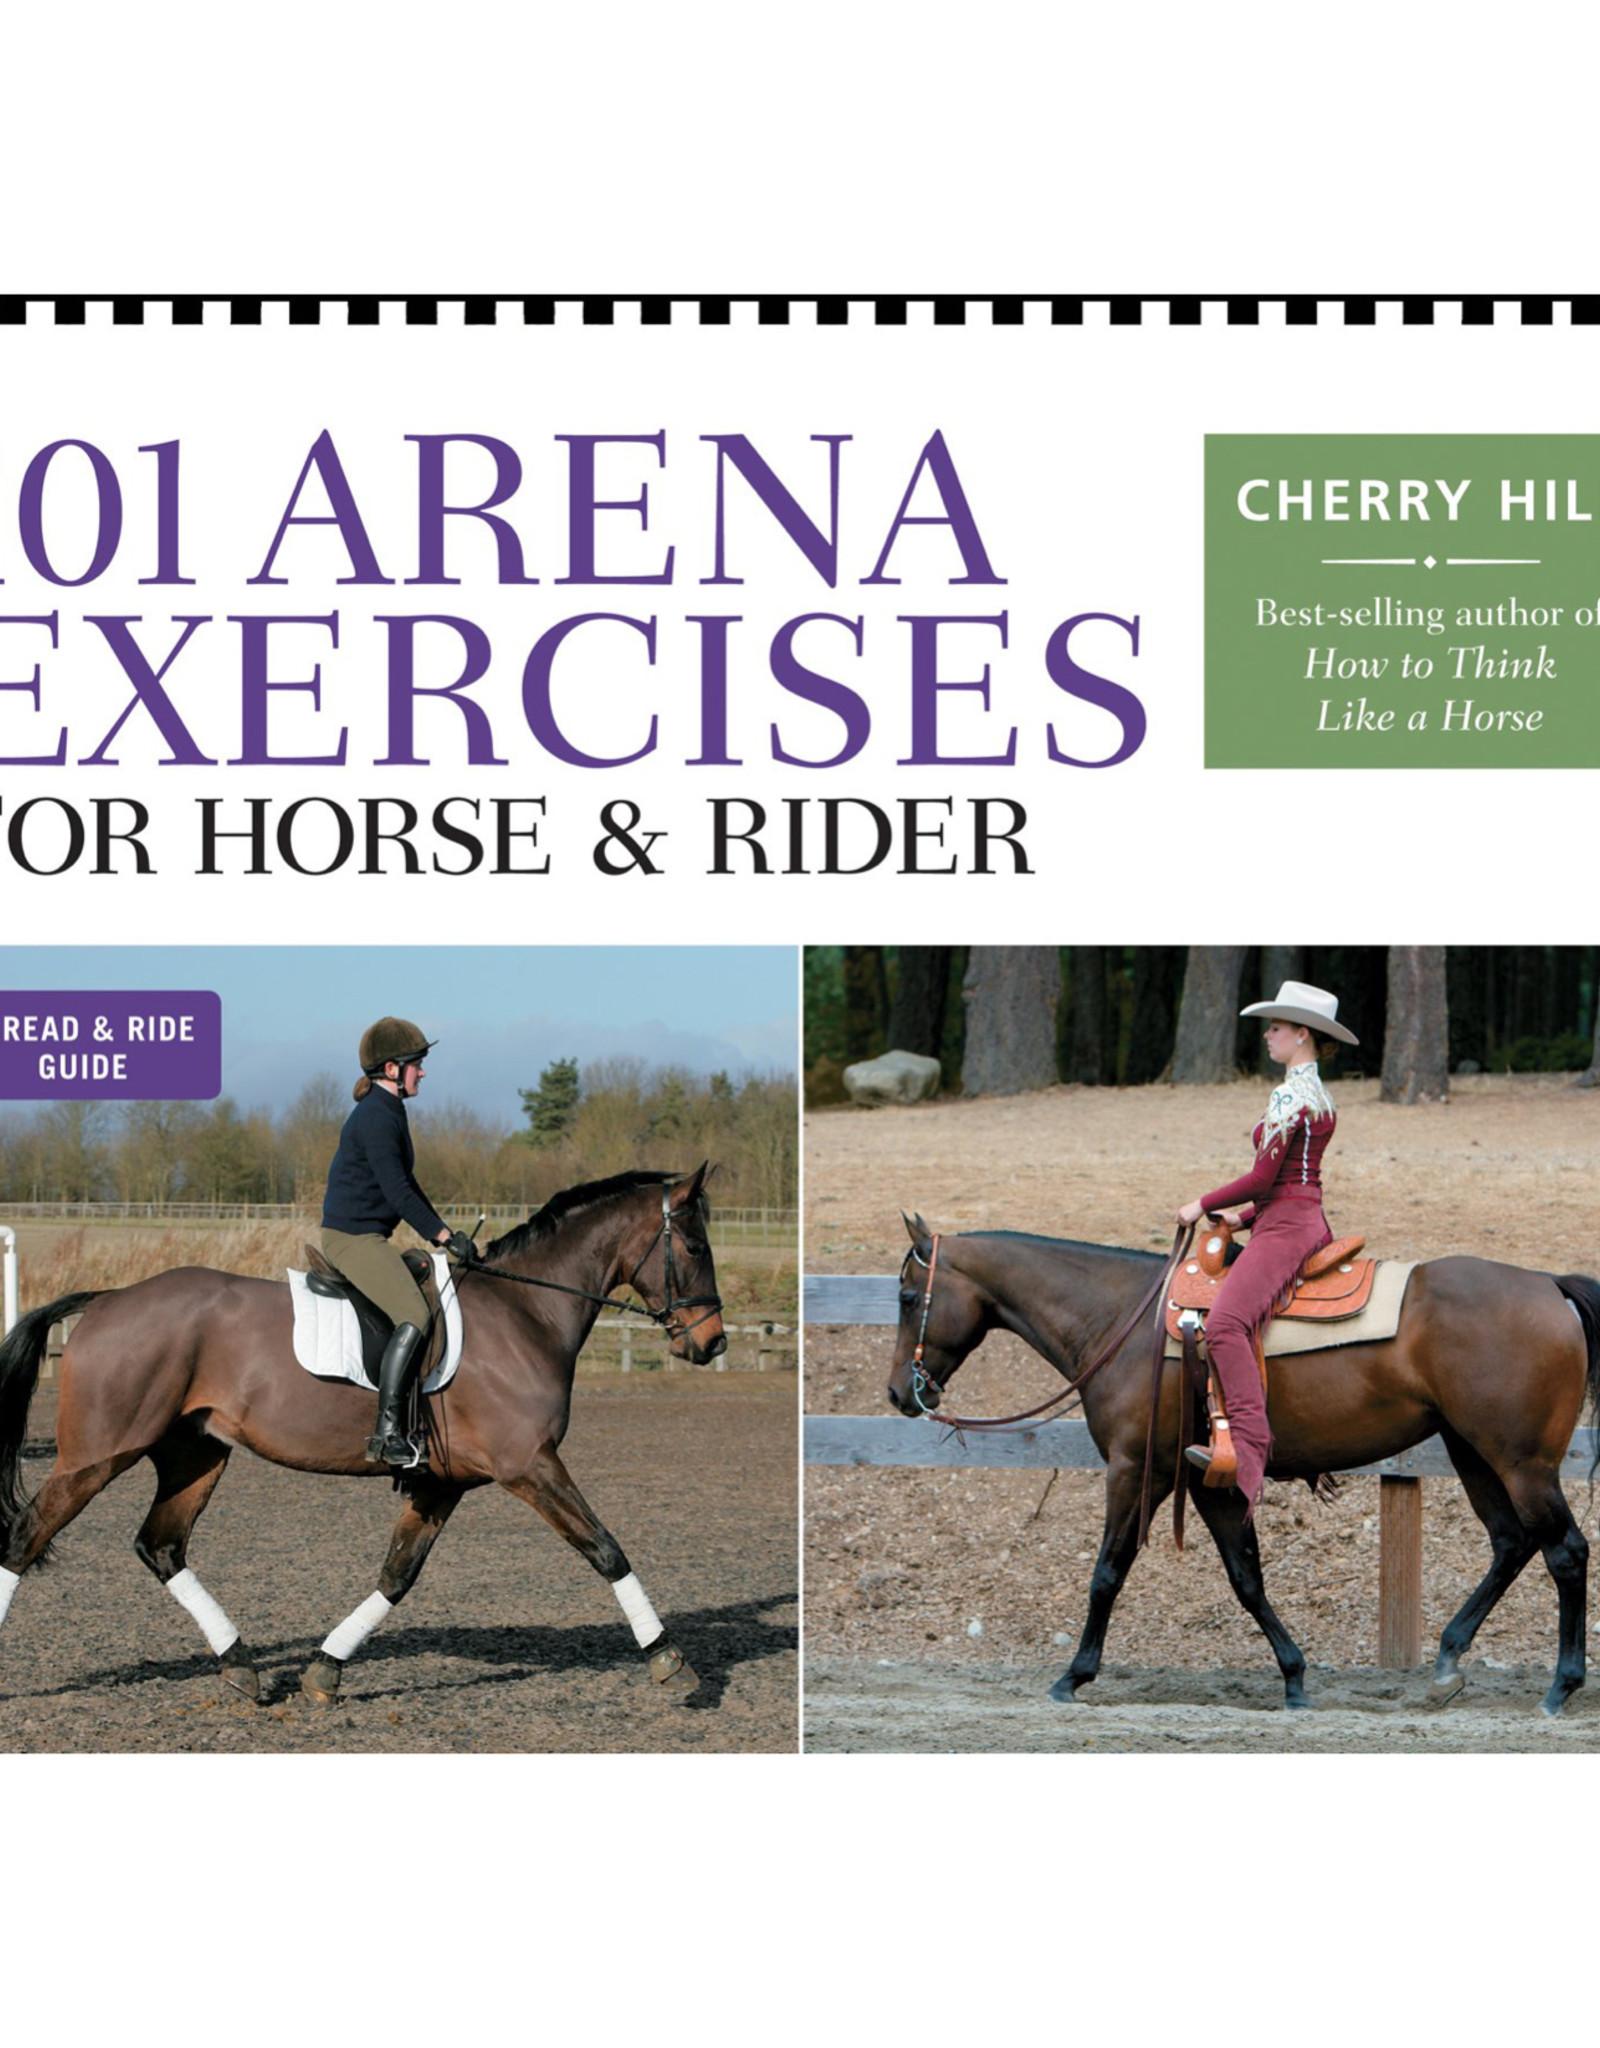 101 Arena Exercises For Horse Rider Calabasas Saddlery